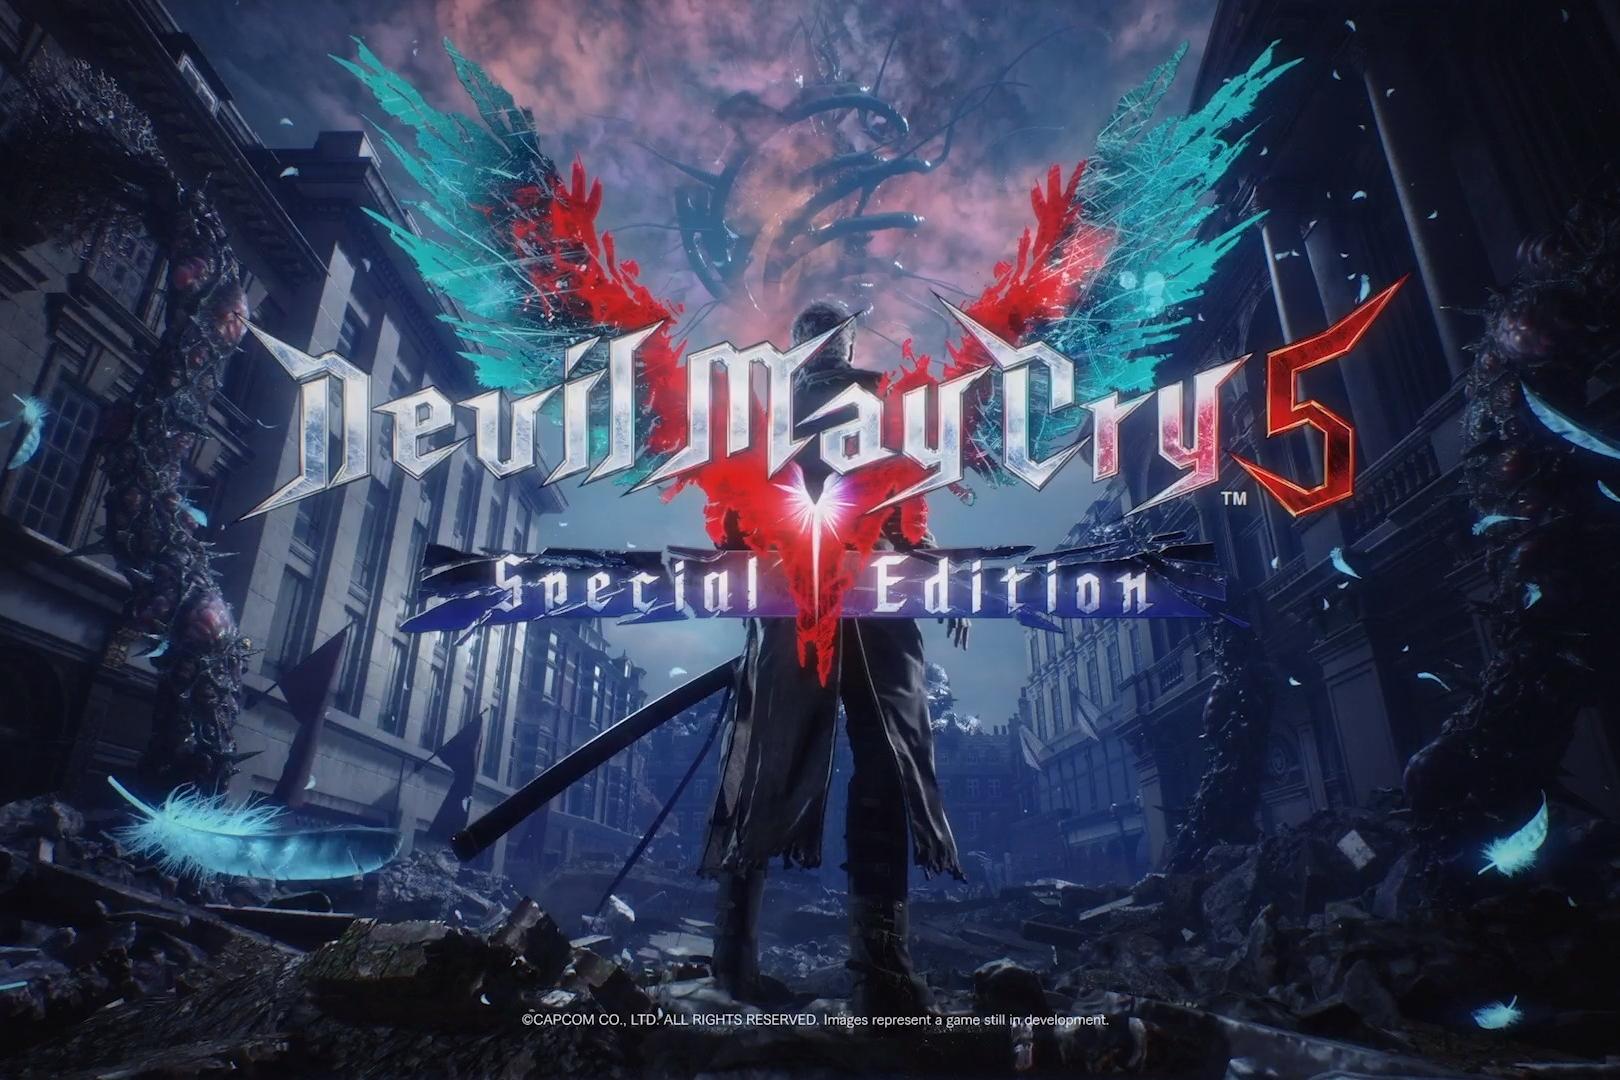 Capcom anuncia Devil May Cry 5 Special Edition, que terá Virgil jogável